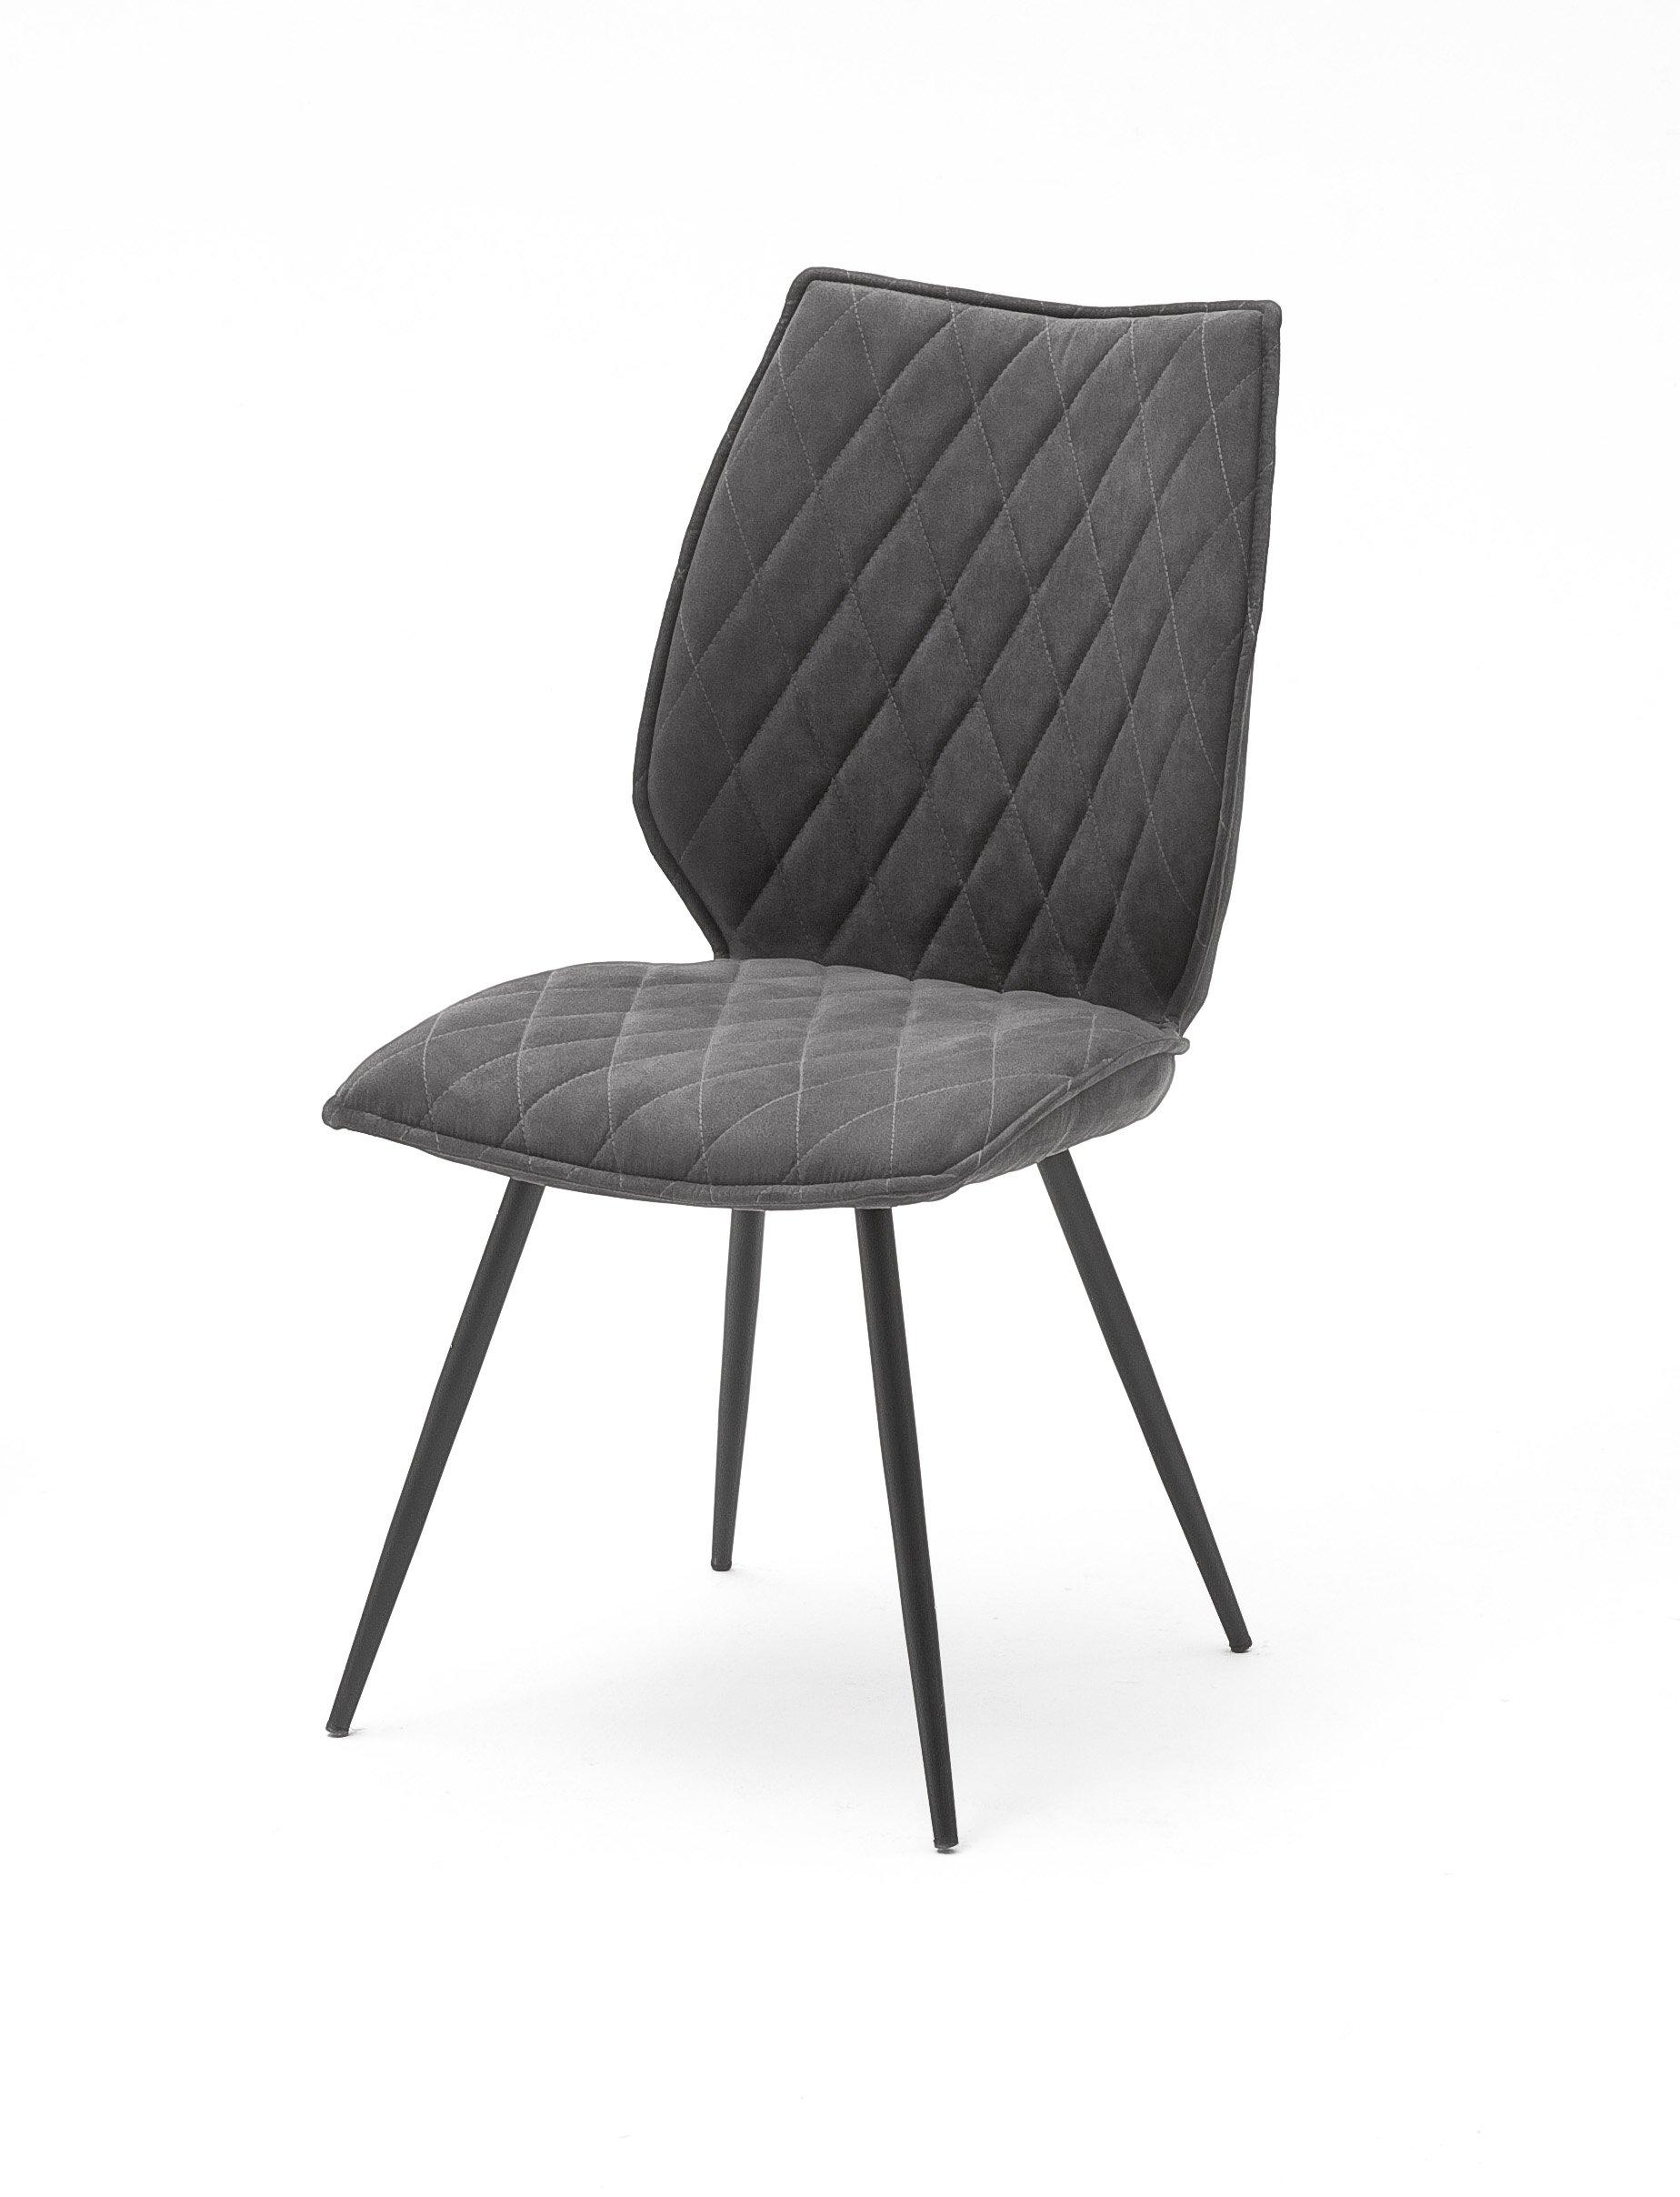 4 Fuß Stuhl, anthrazit